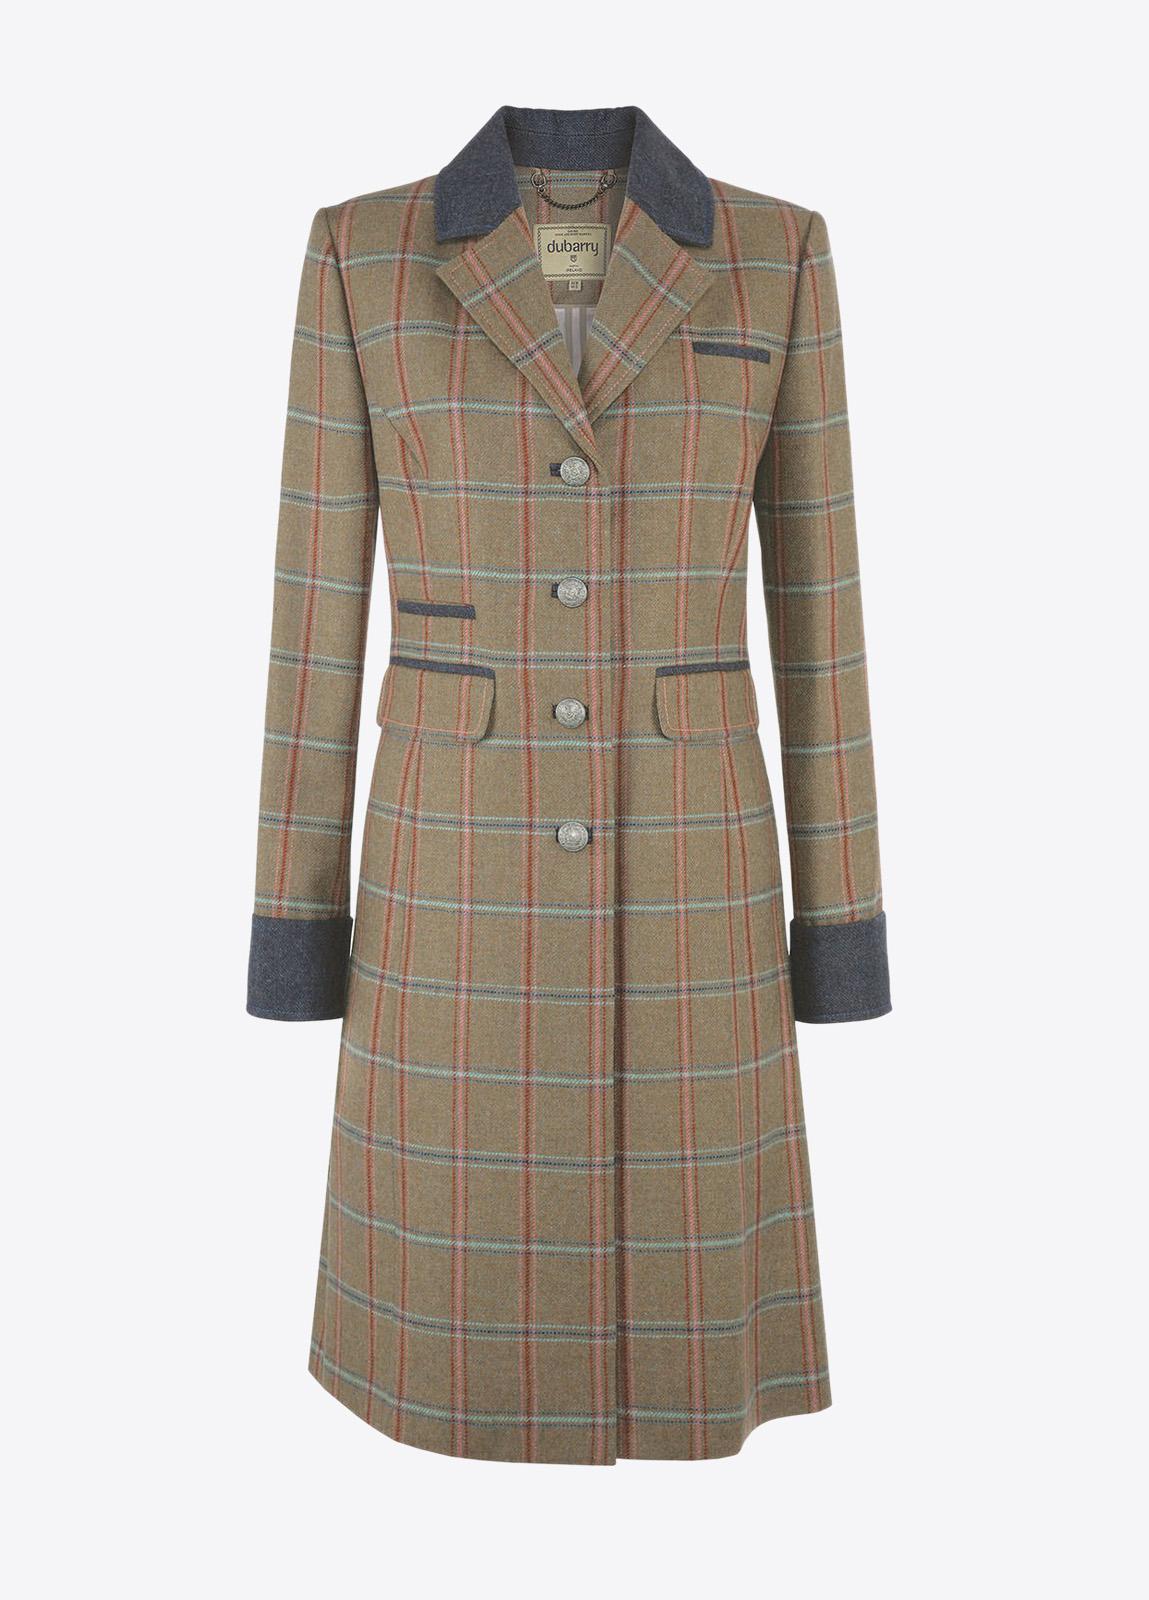 Blackthorn Tweed Jacket - Connacht Meadow